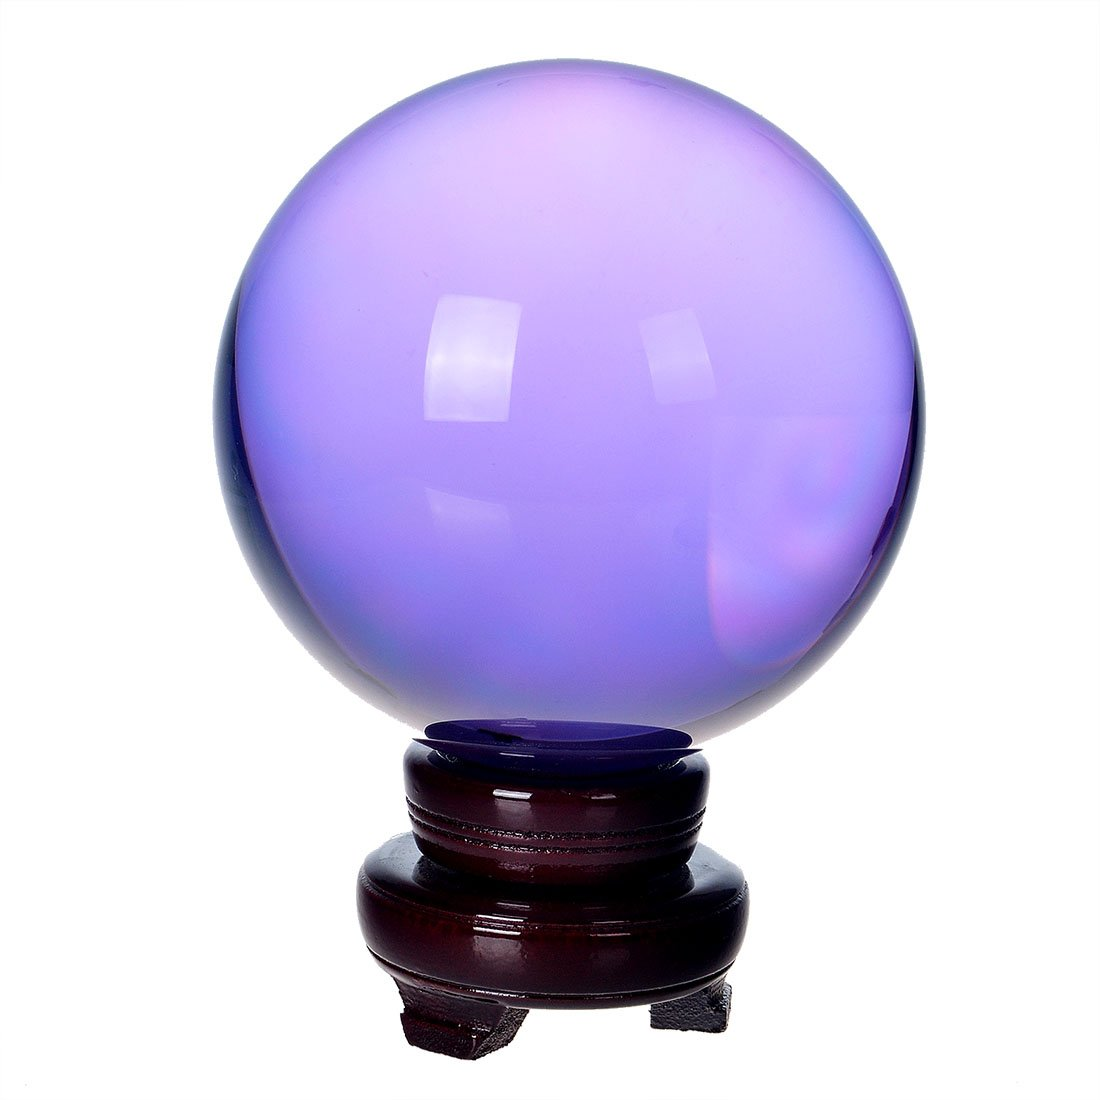 H&D Huge Asian Quartz Light Purple Magic Crystal Ball Sphere 200 Mm Clear Free Stand Decor